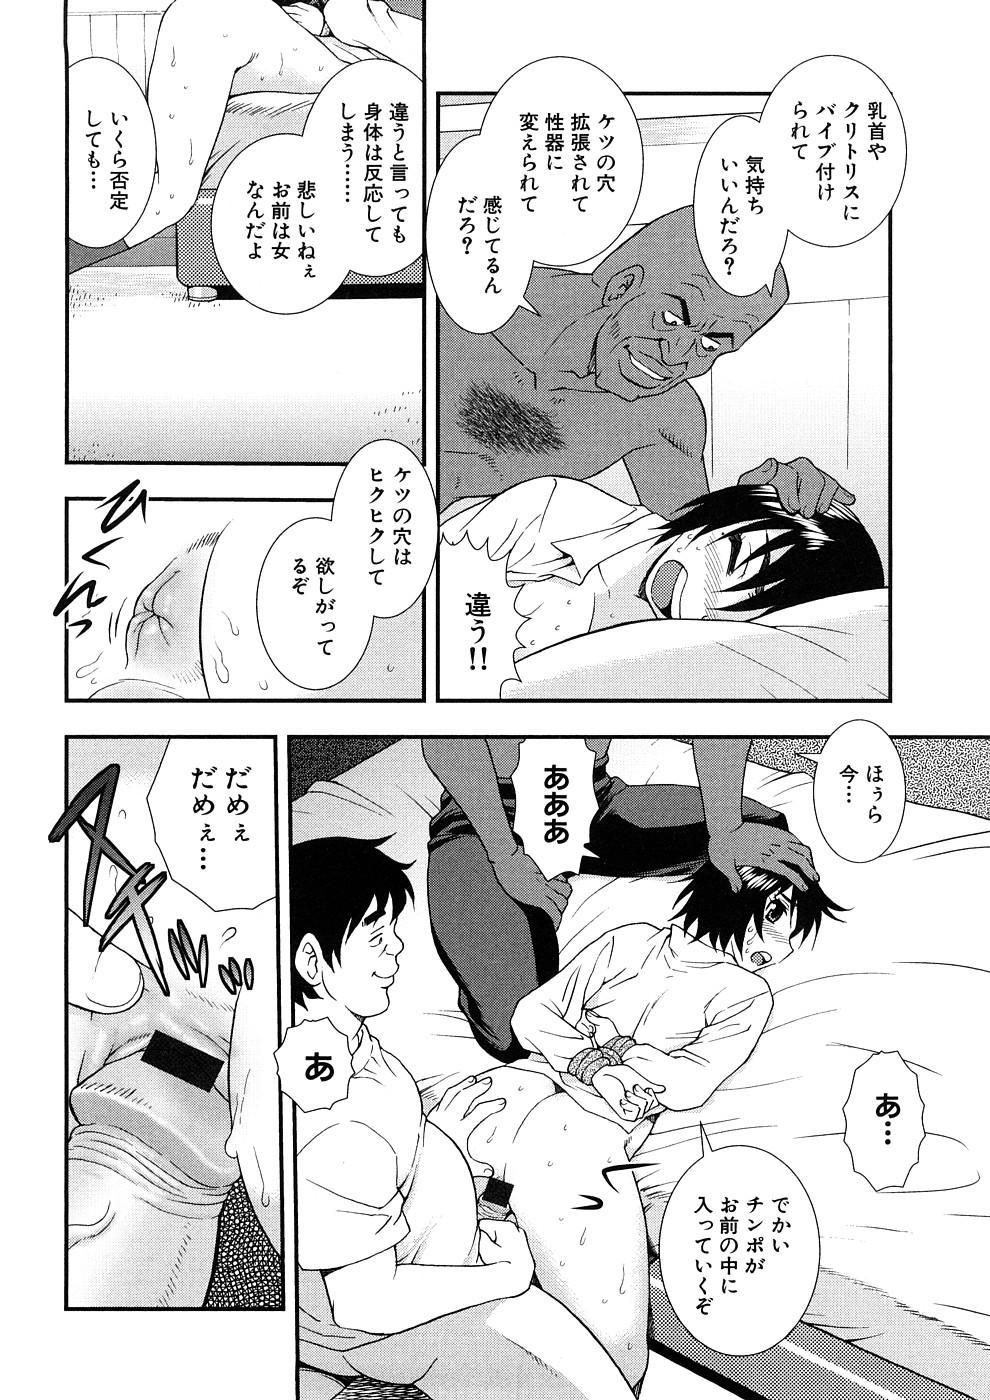 Geki Yaba Anthology Vol. 1 - Naka ni Dashite yo 184